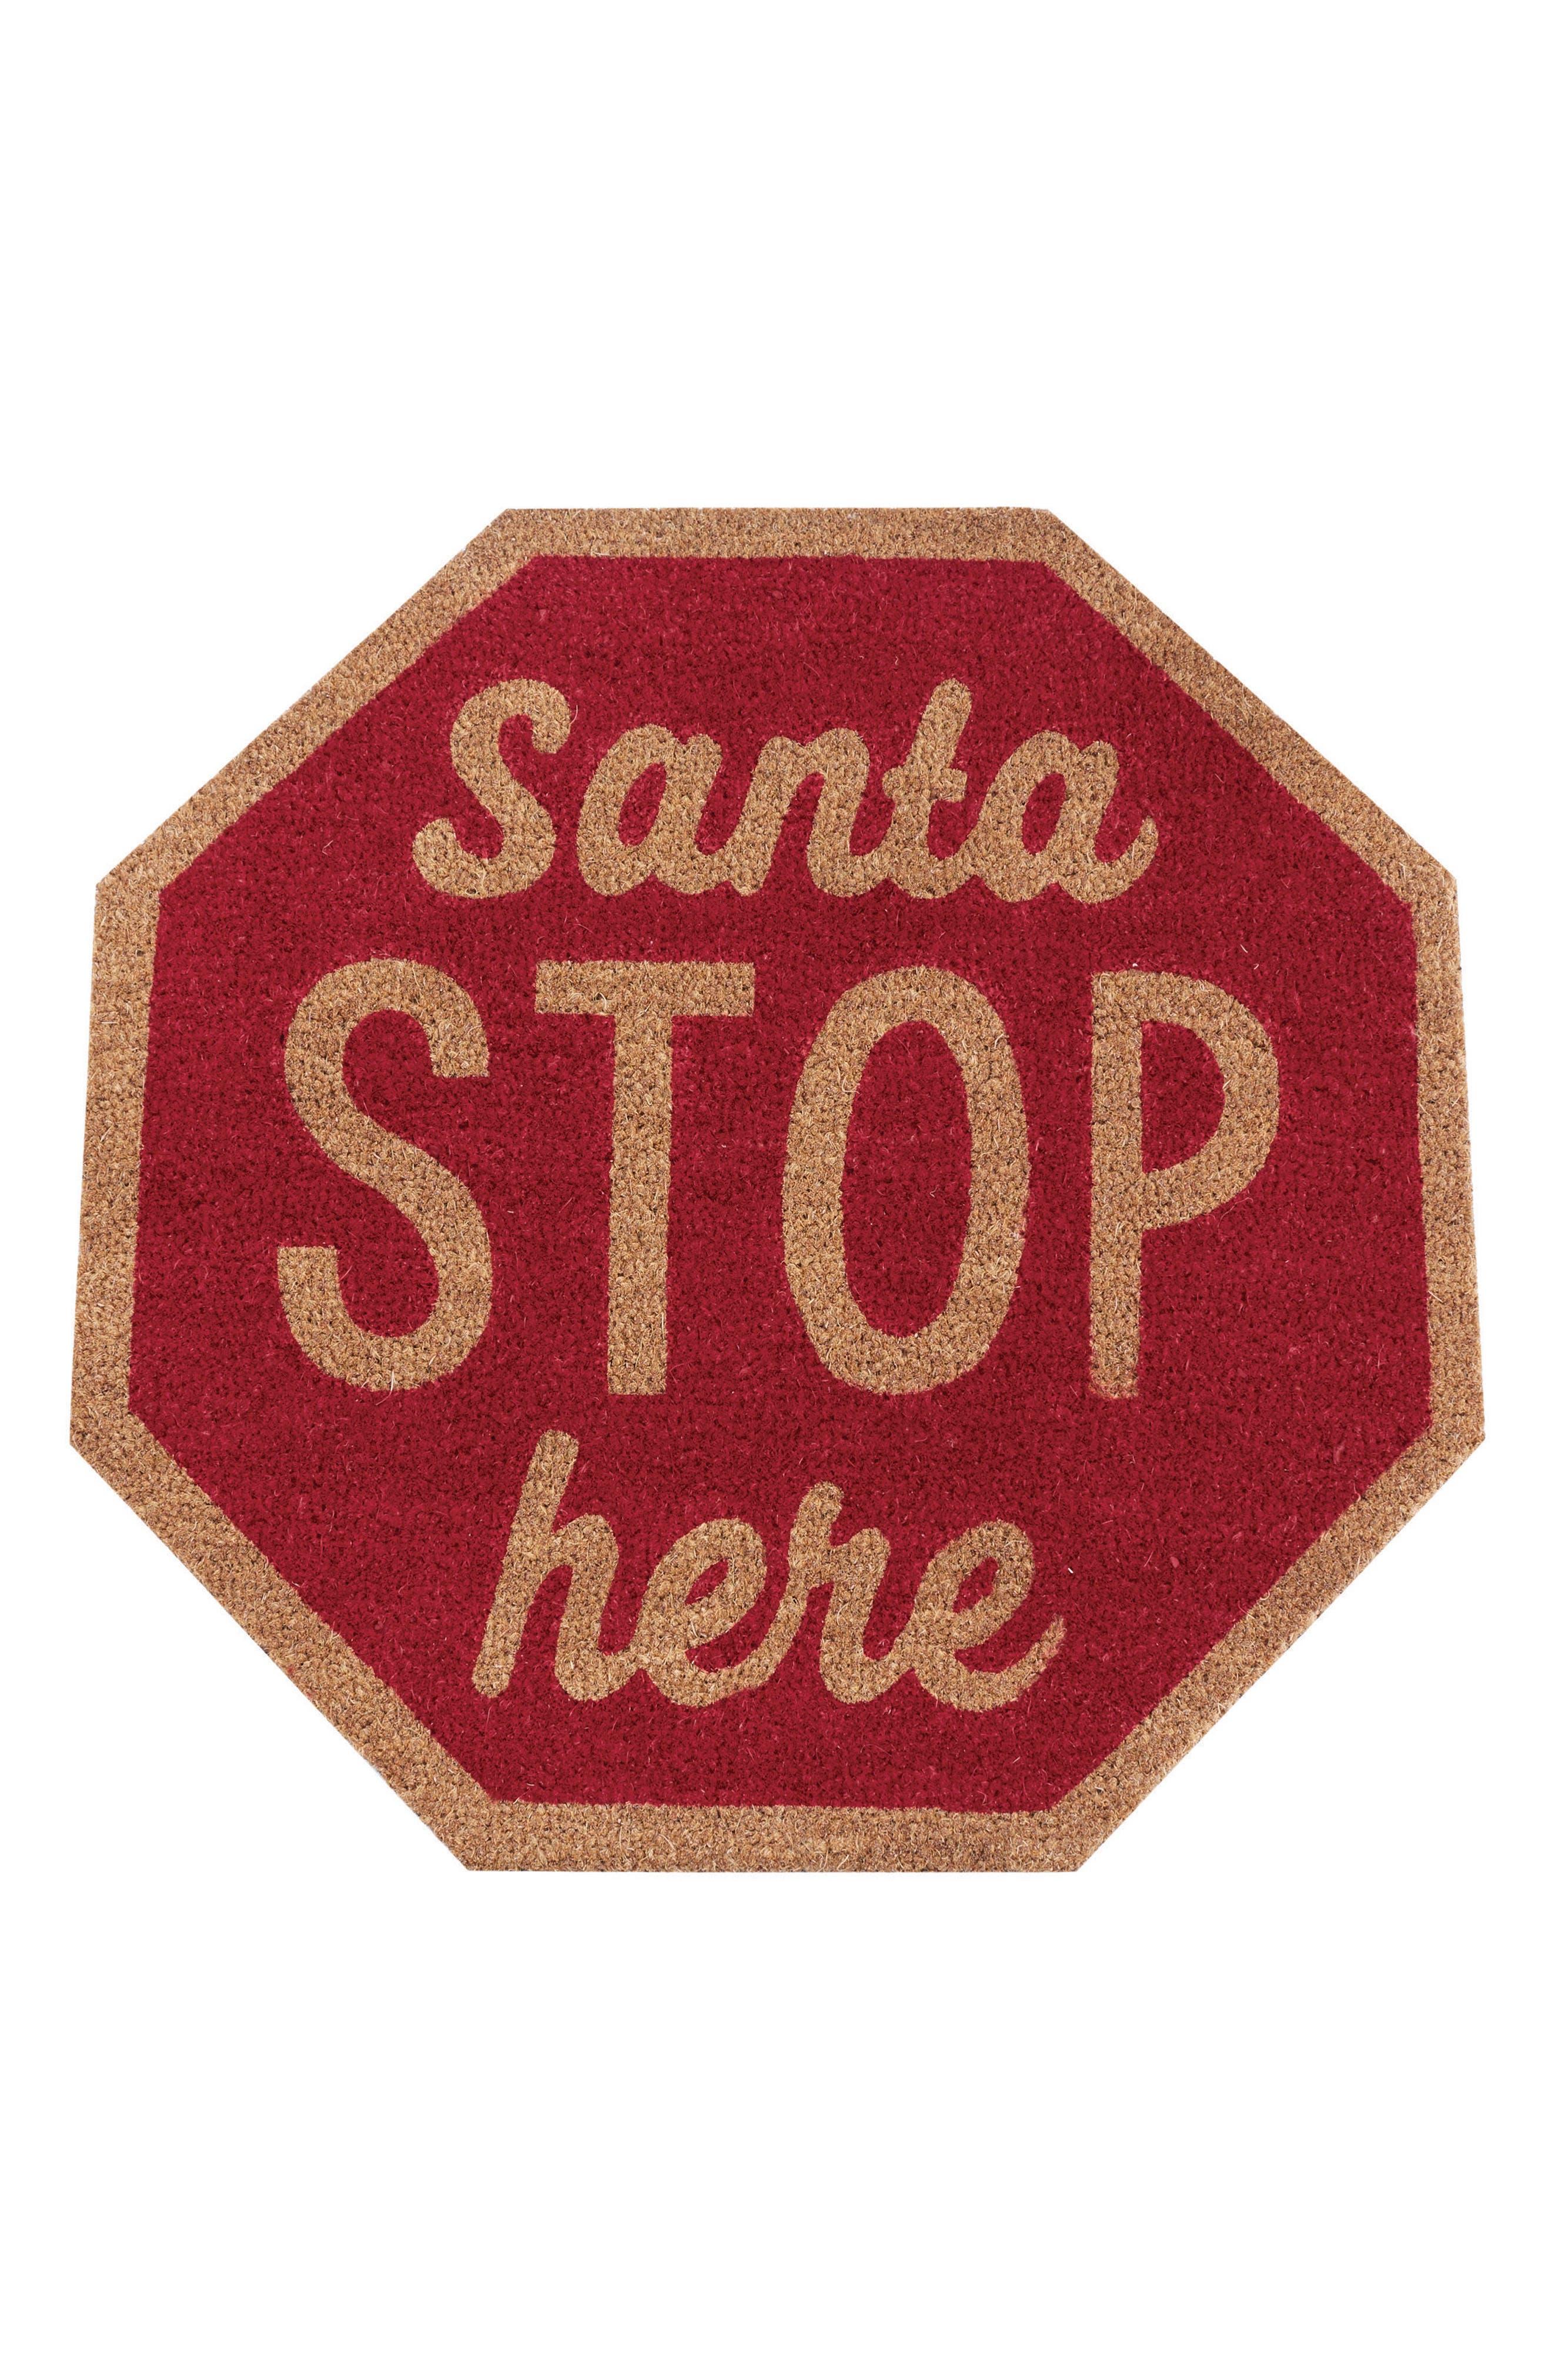 Santa Stop Here Coir Door Mat,                             Main thumbnail 1, color,                             600